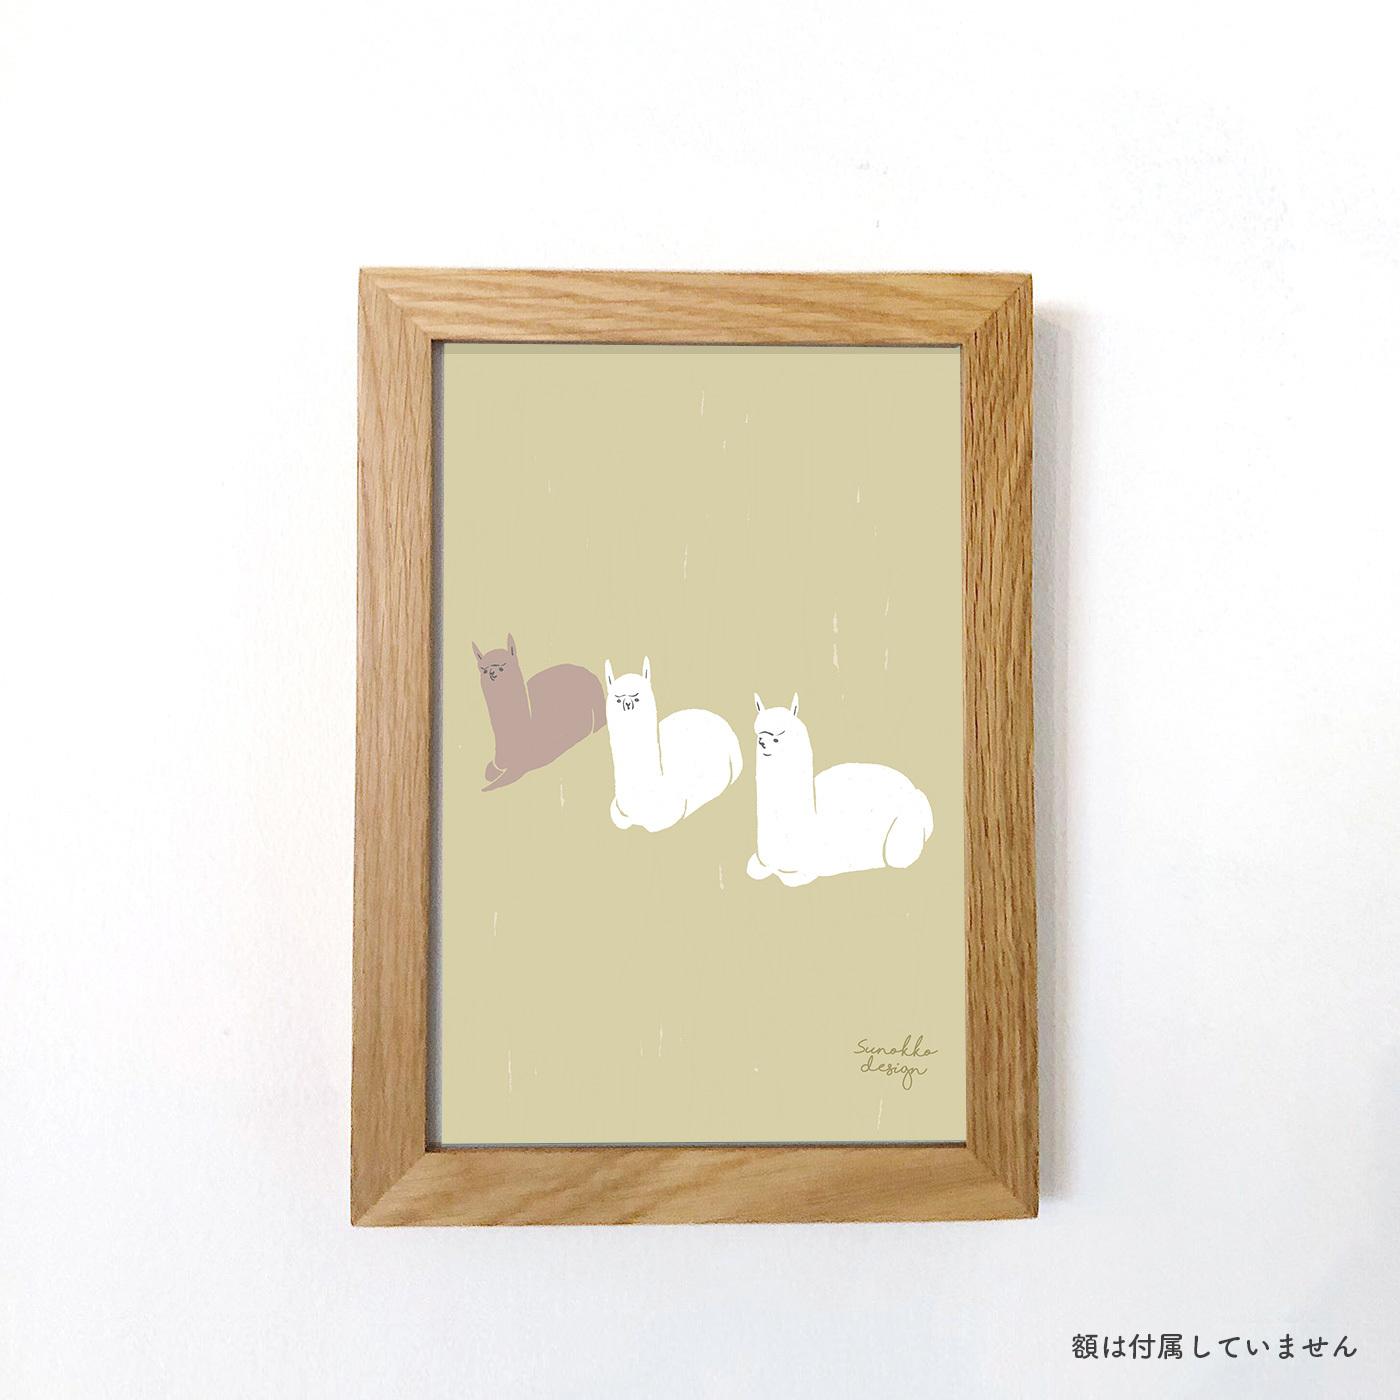 A5アートポスター [あつまり]